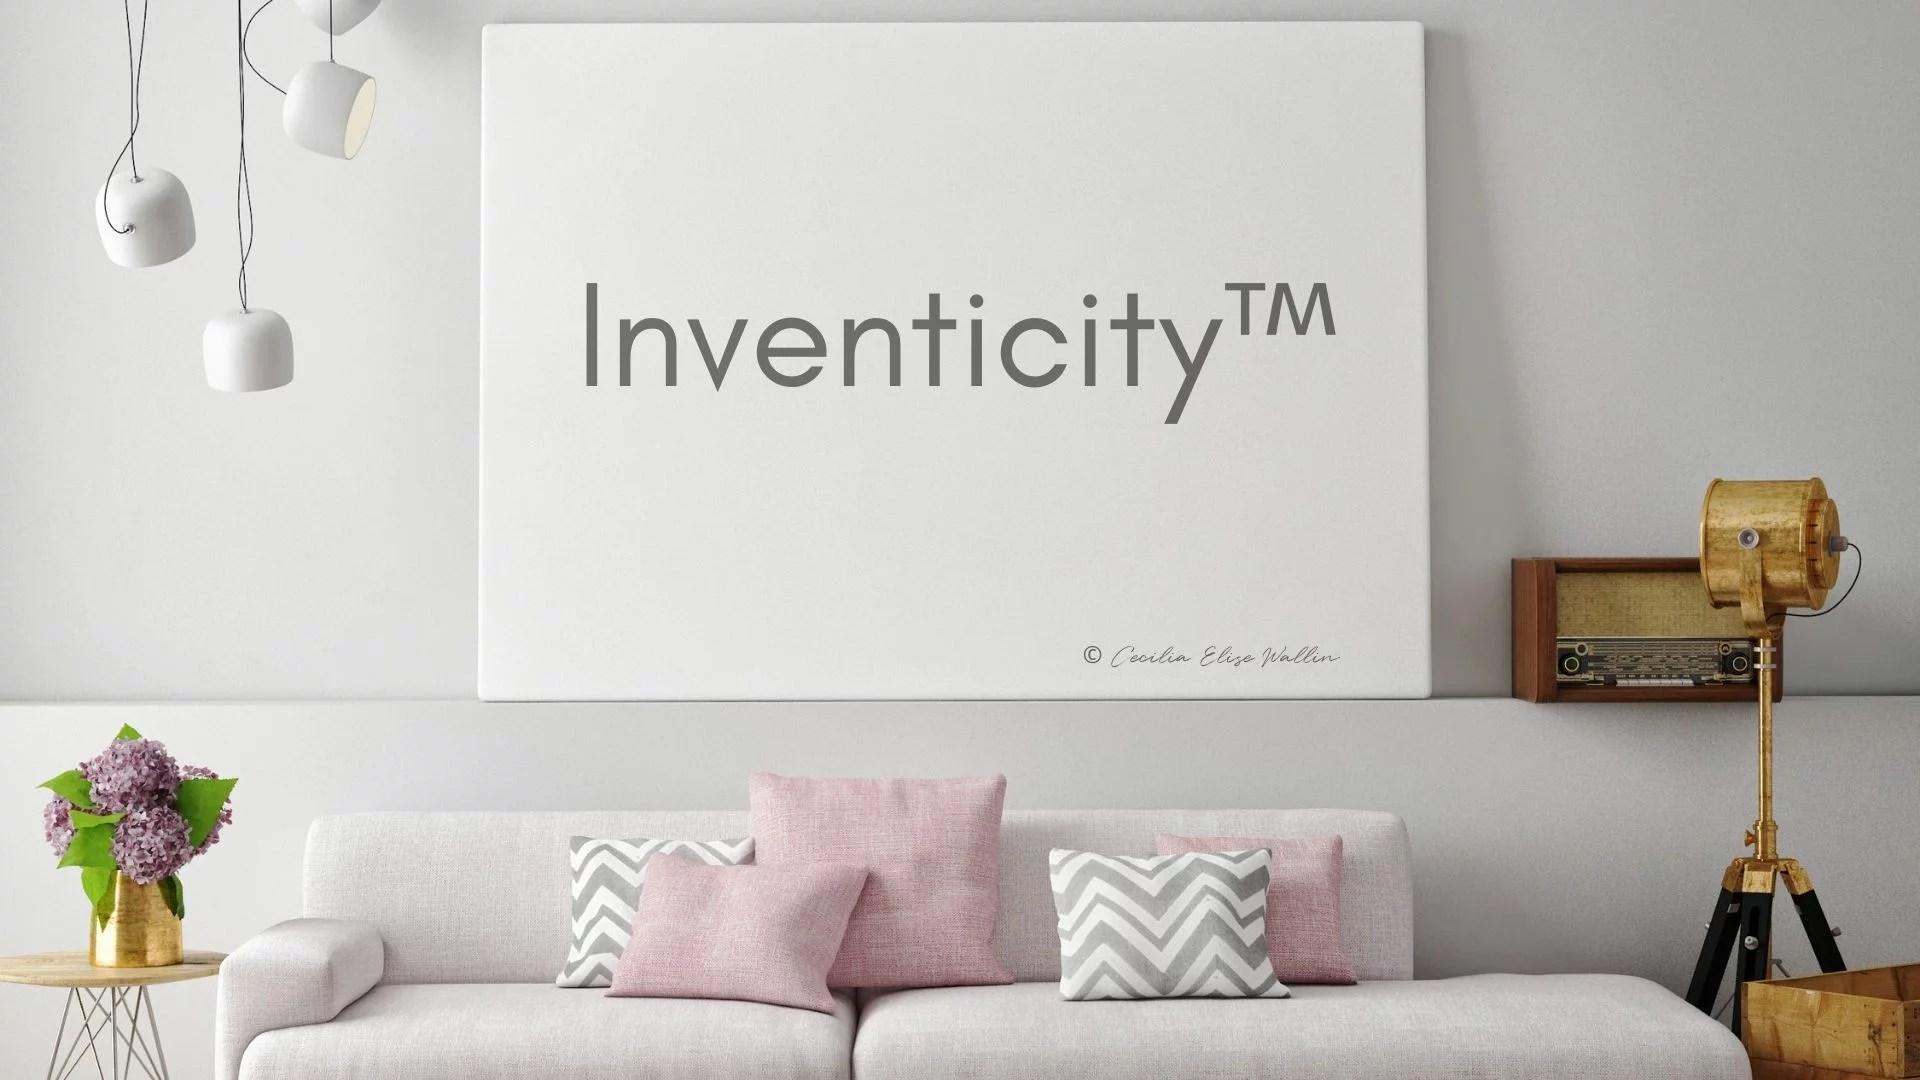 Inventicity™ © Cecilia Elise Wallin